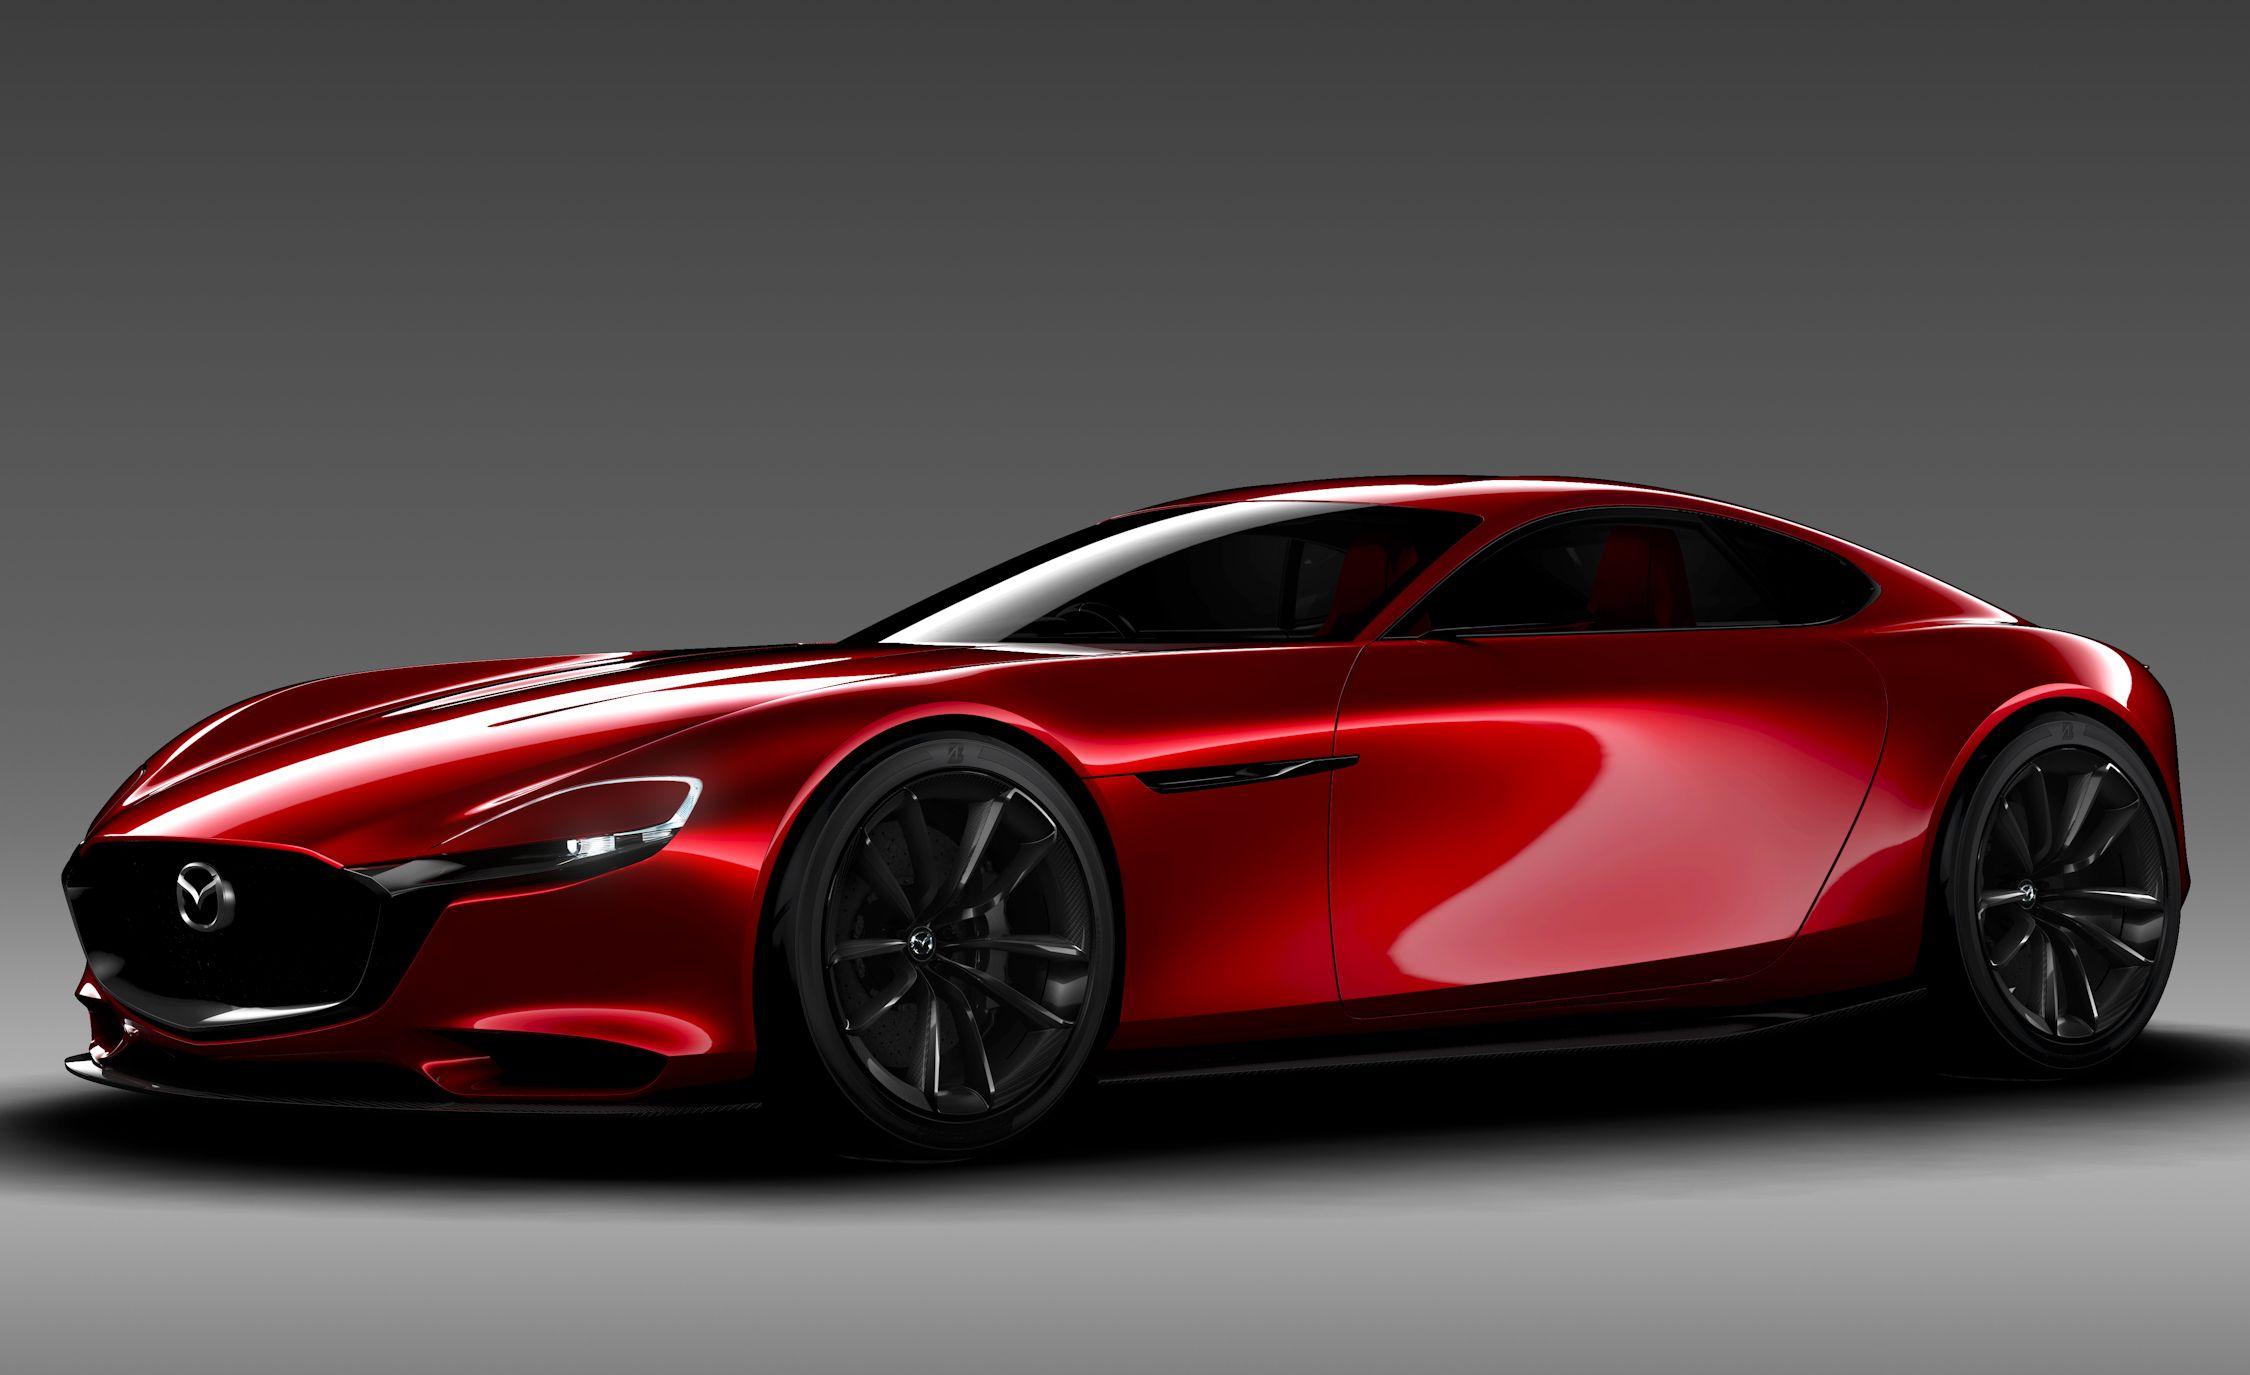 Mazda S Rotary Engine Returning As Range Extender In An Ev